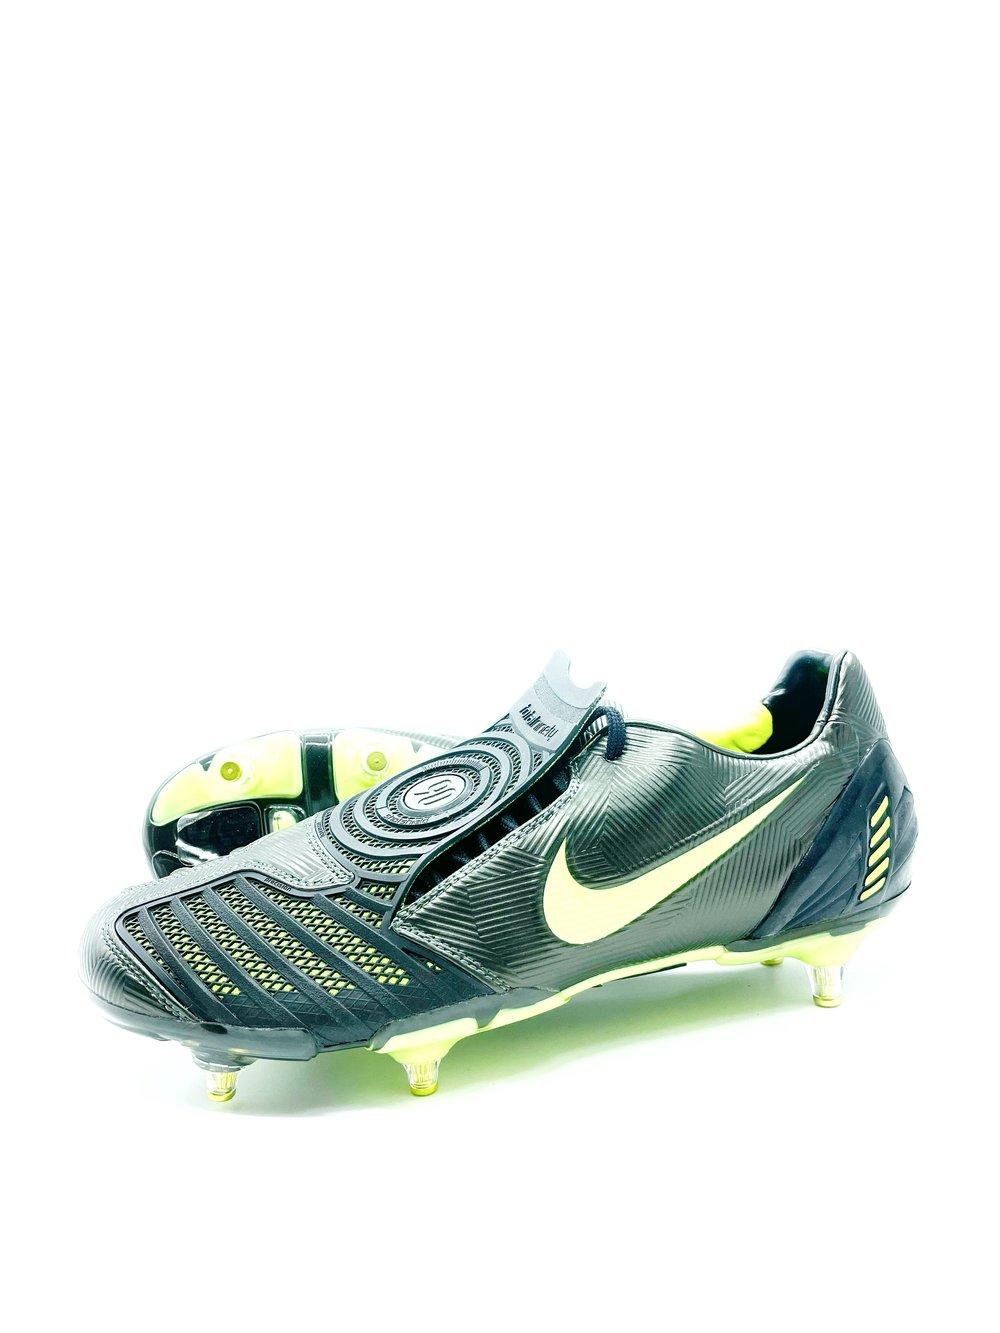 Image of Nike total90 laser SG black electric